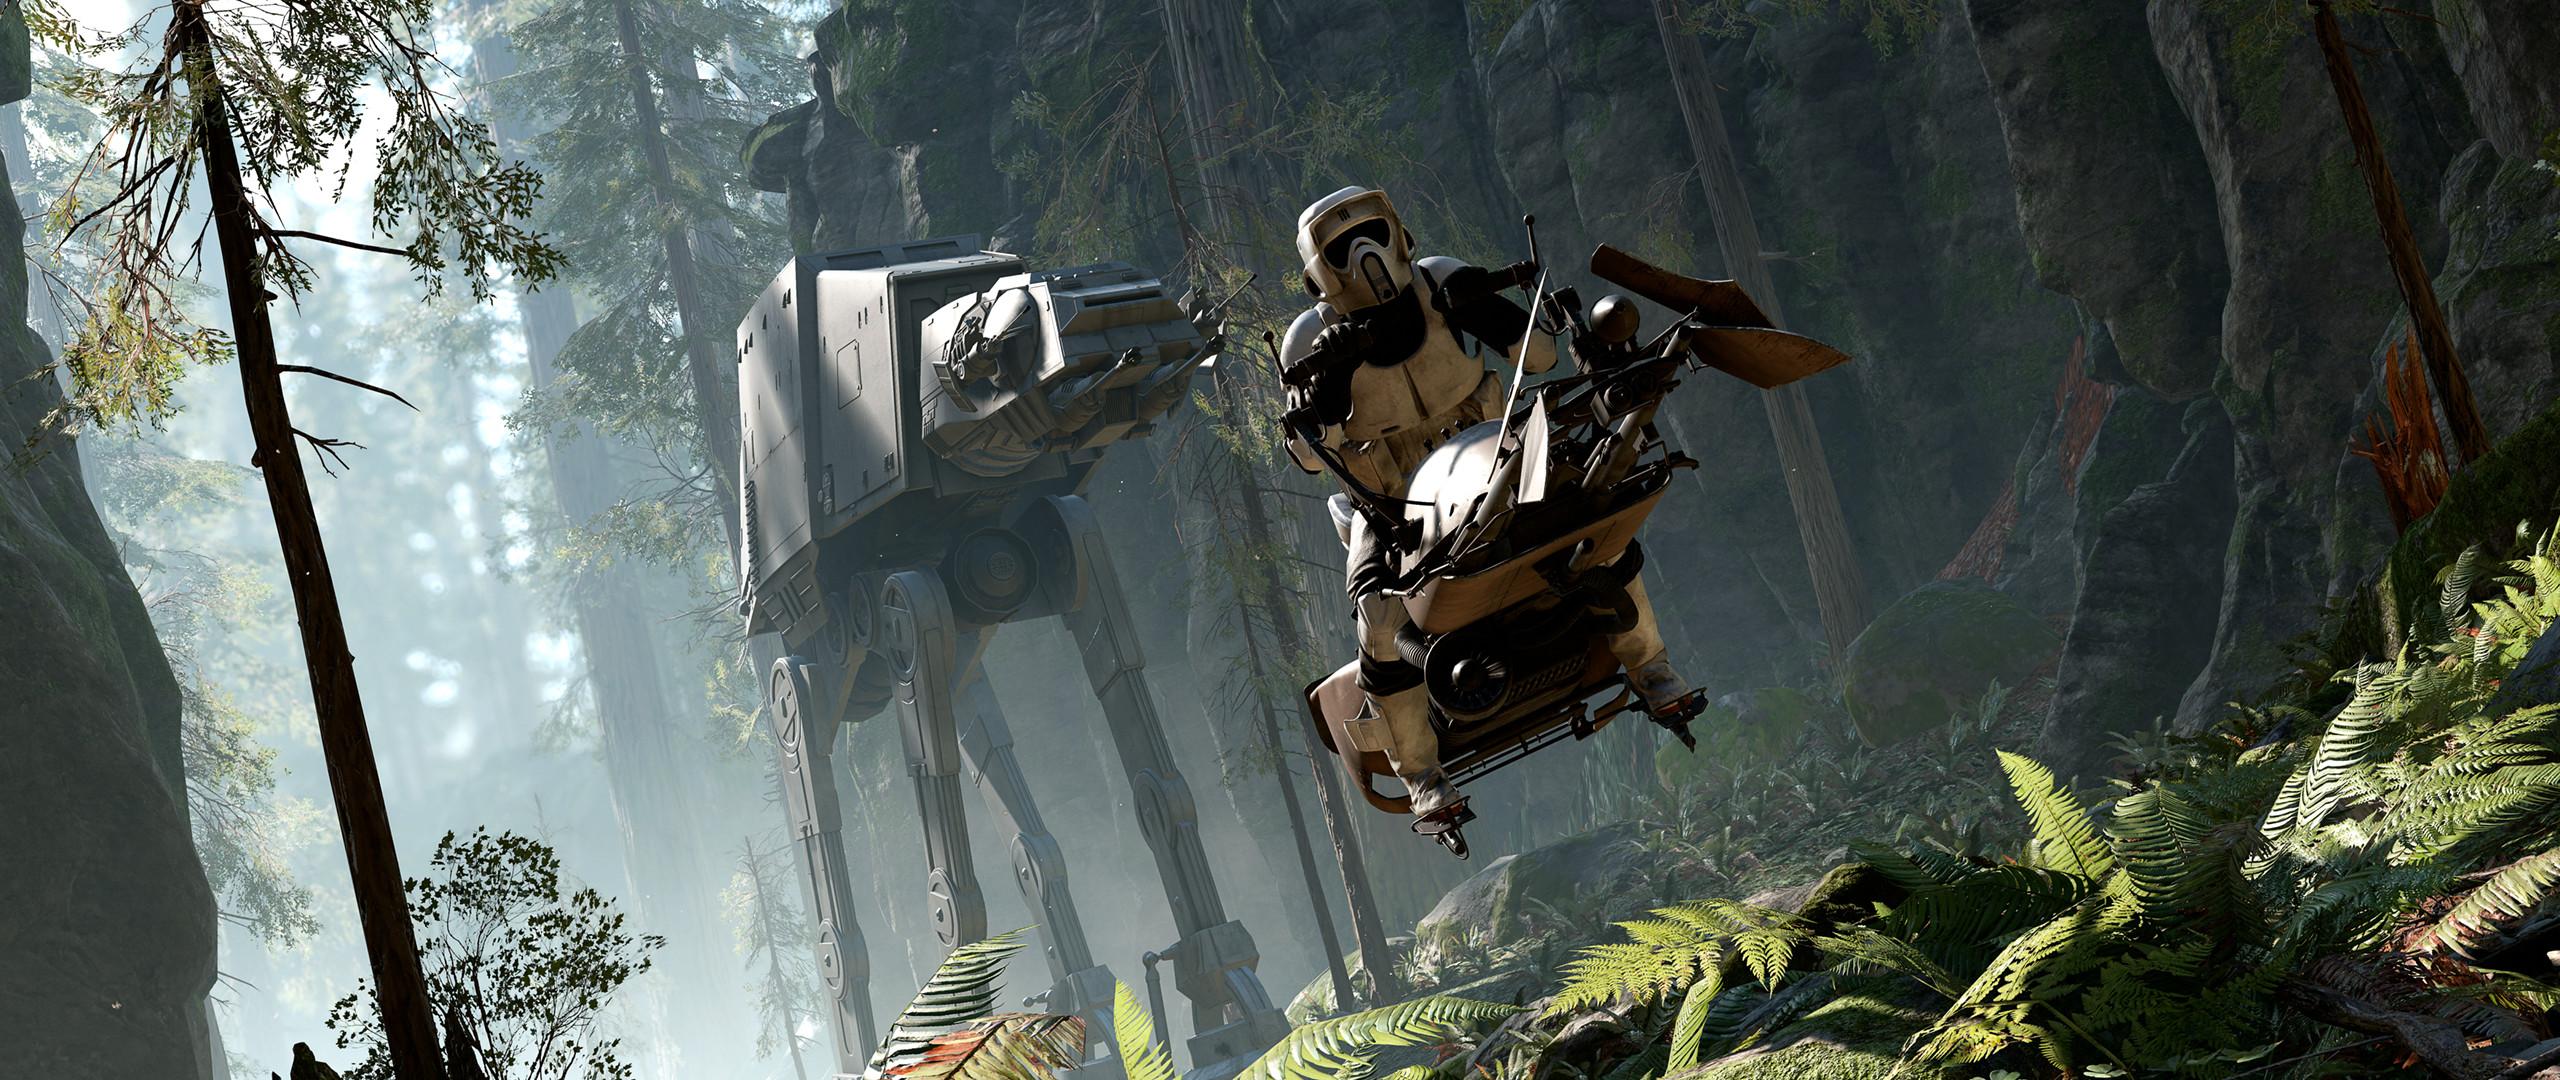 Star Wars Battlefront video Games Wallpapers HD / Desktop and Mobile  Backgrounds